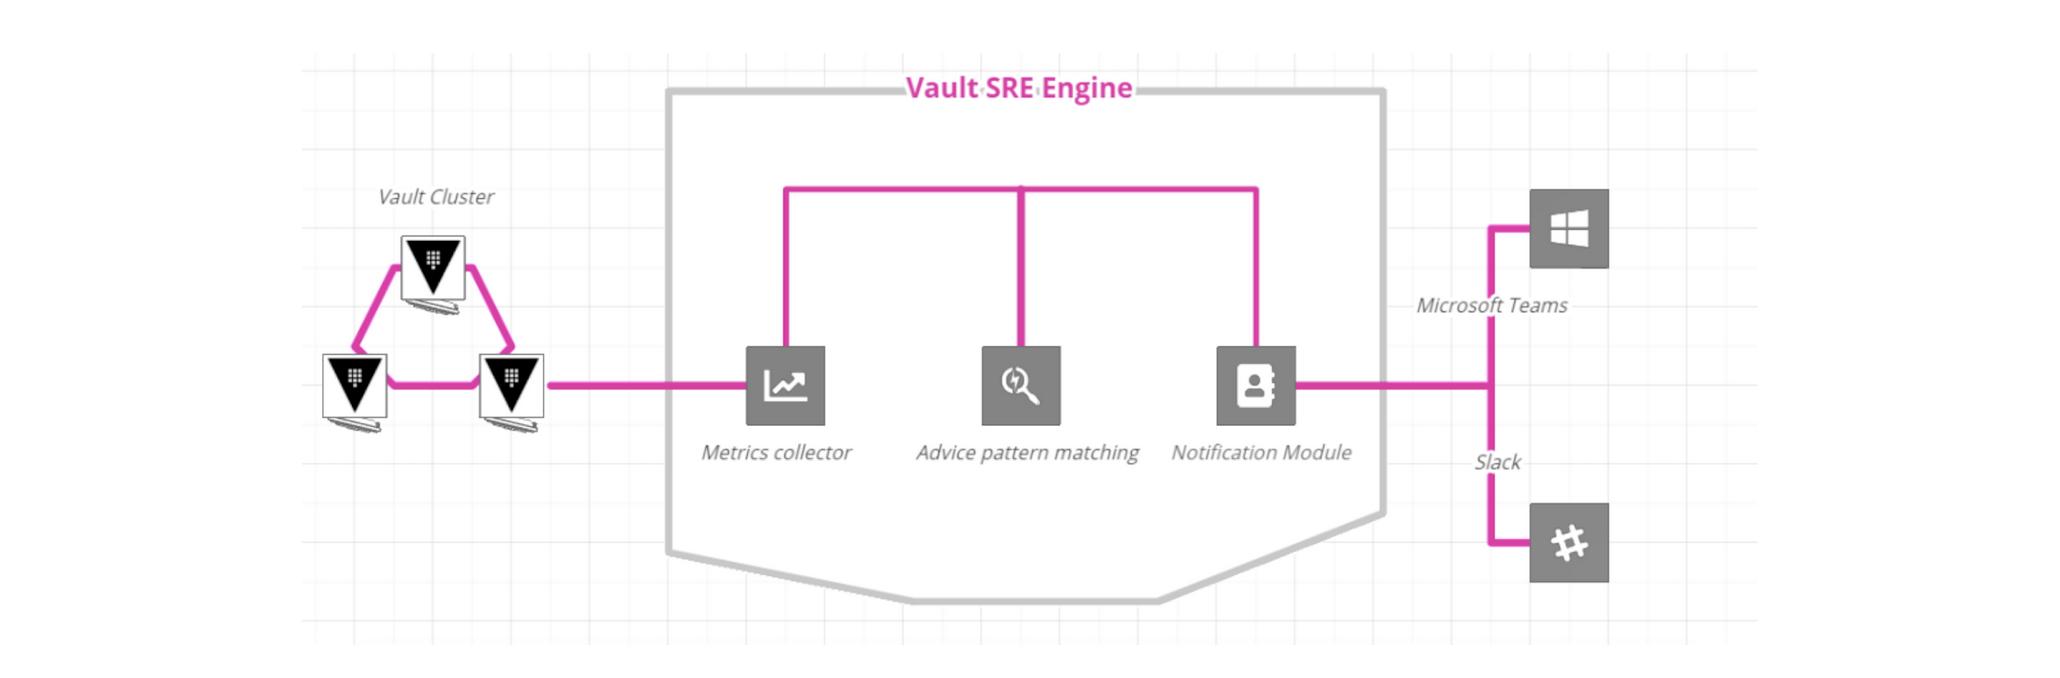 Vault SRE Engine Architecture